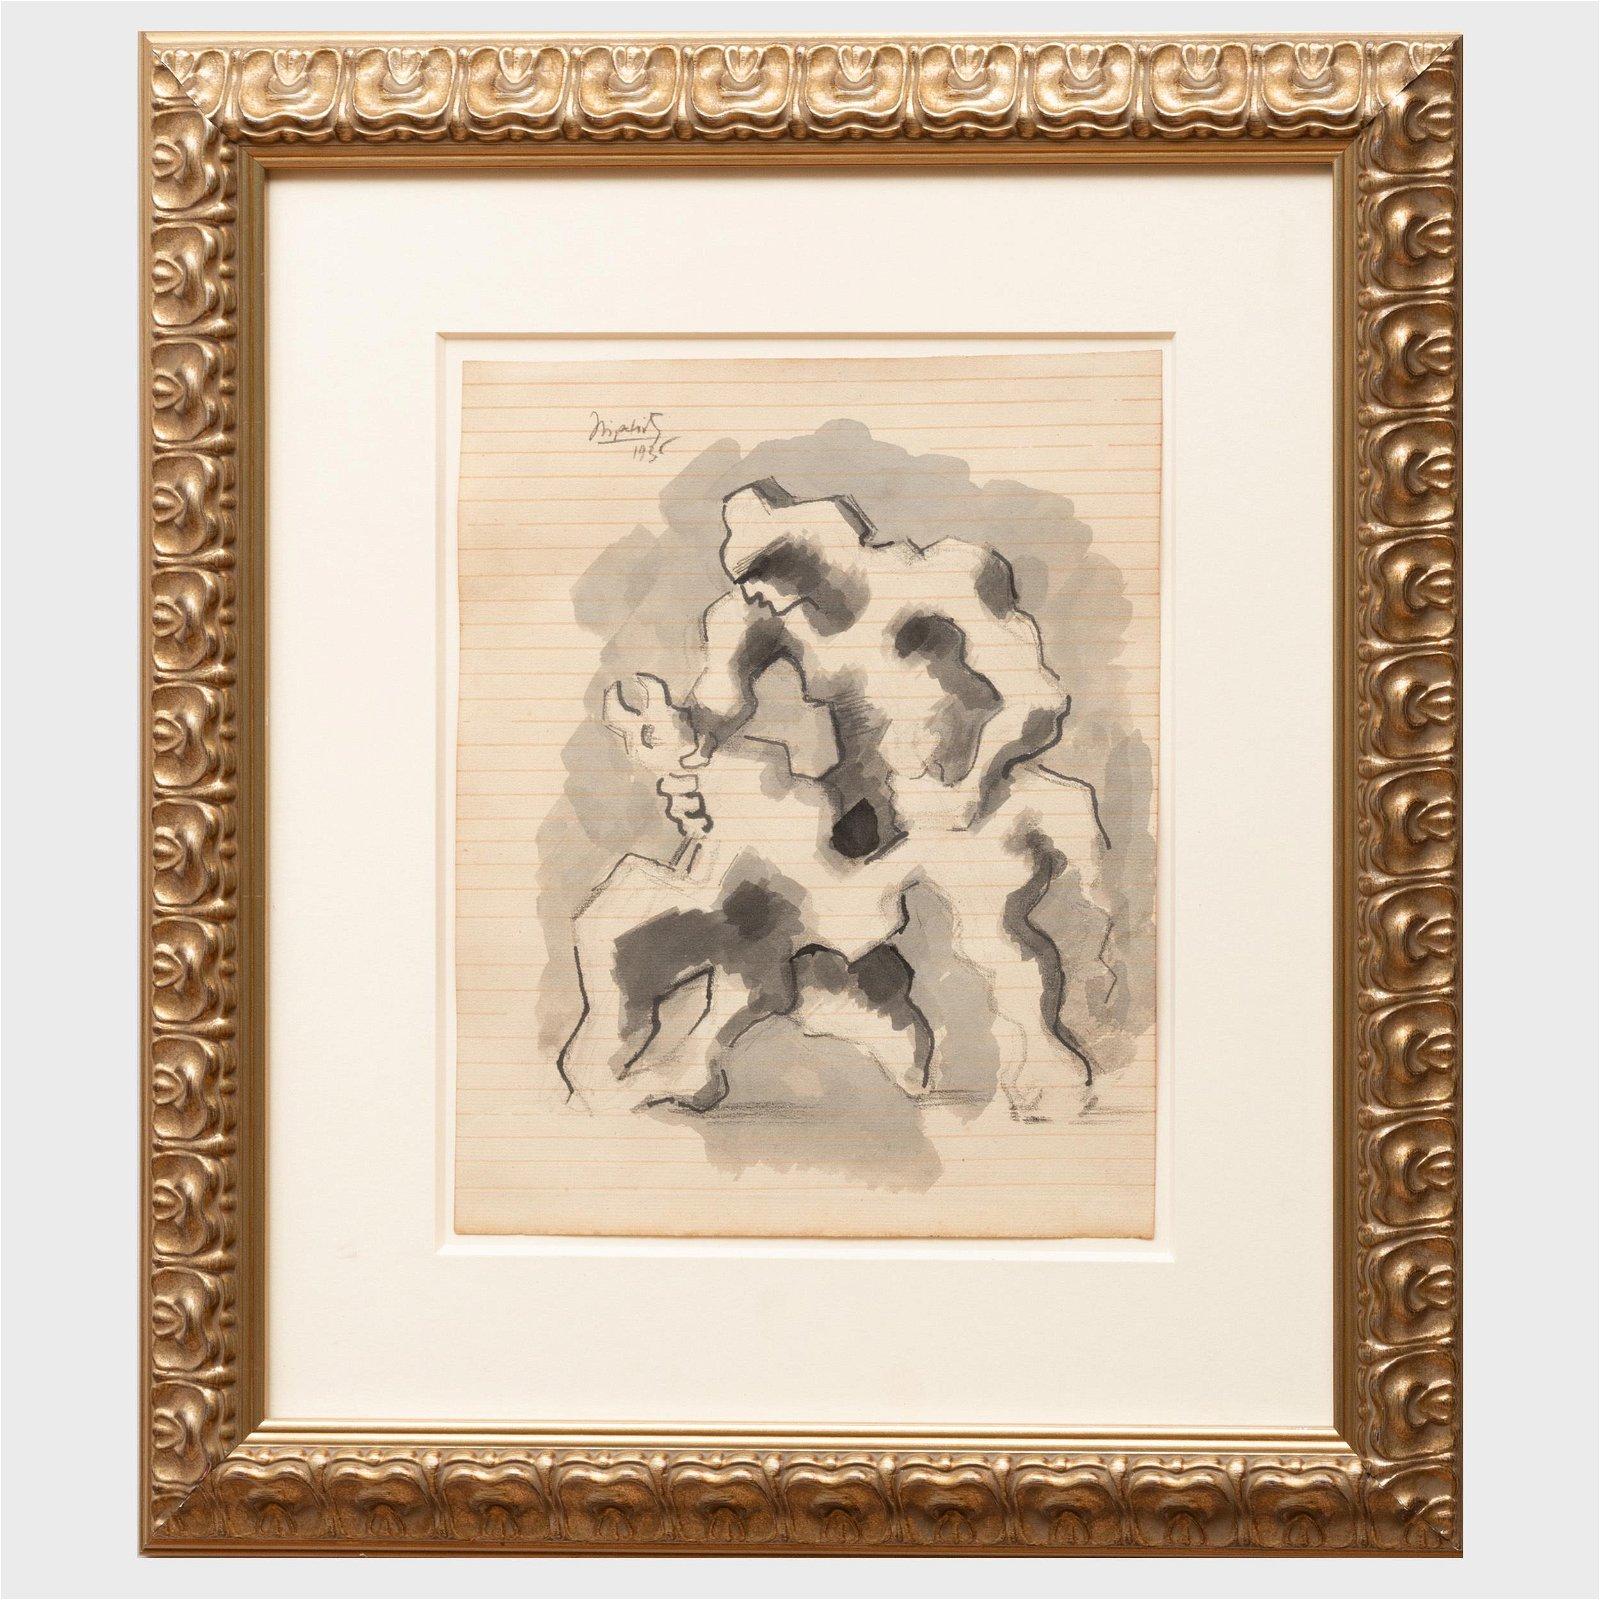 Jacques Lipchitz (1891-1973): Prometheus Strangling the